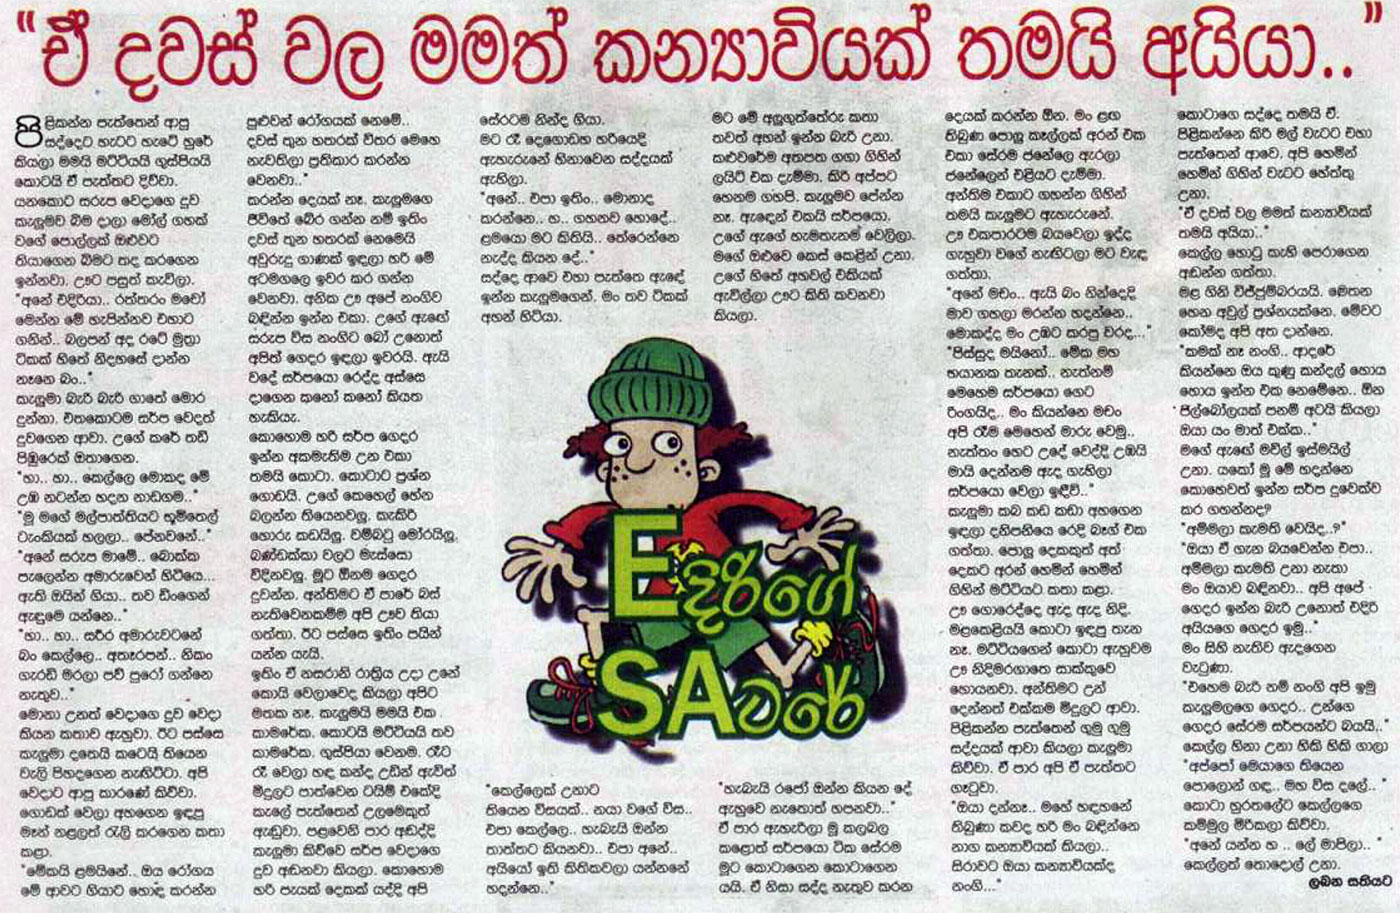 Edirige satare latestsinhala kathasinhala paththaralanka fun